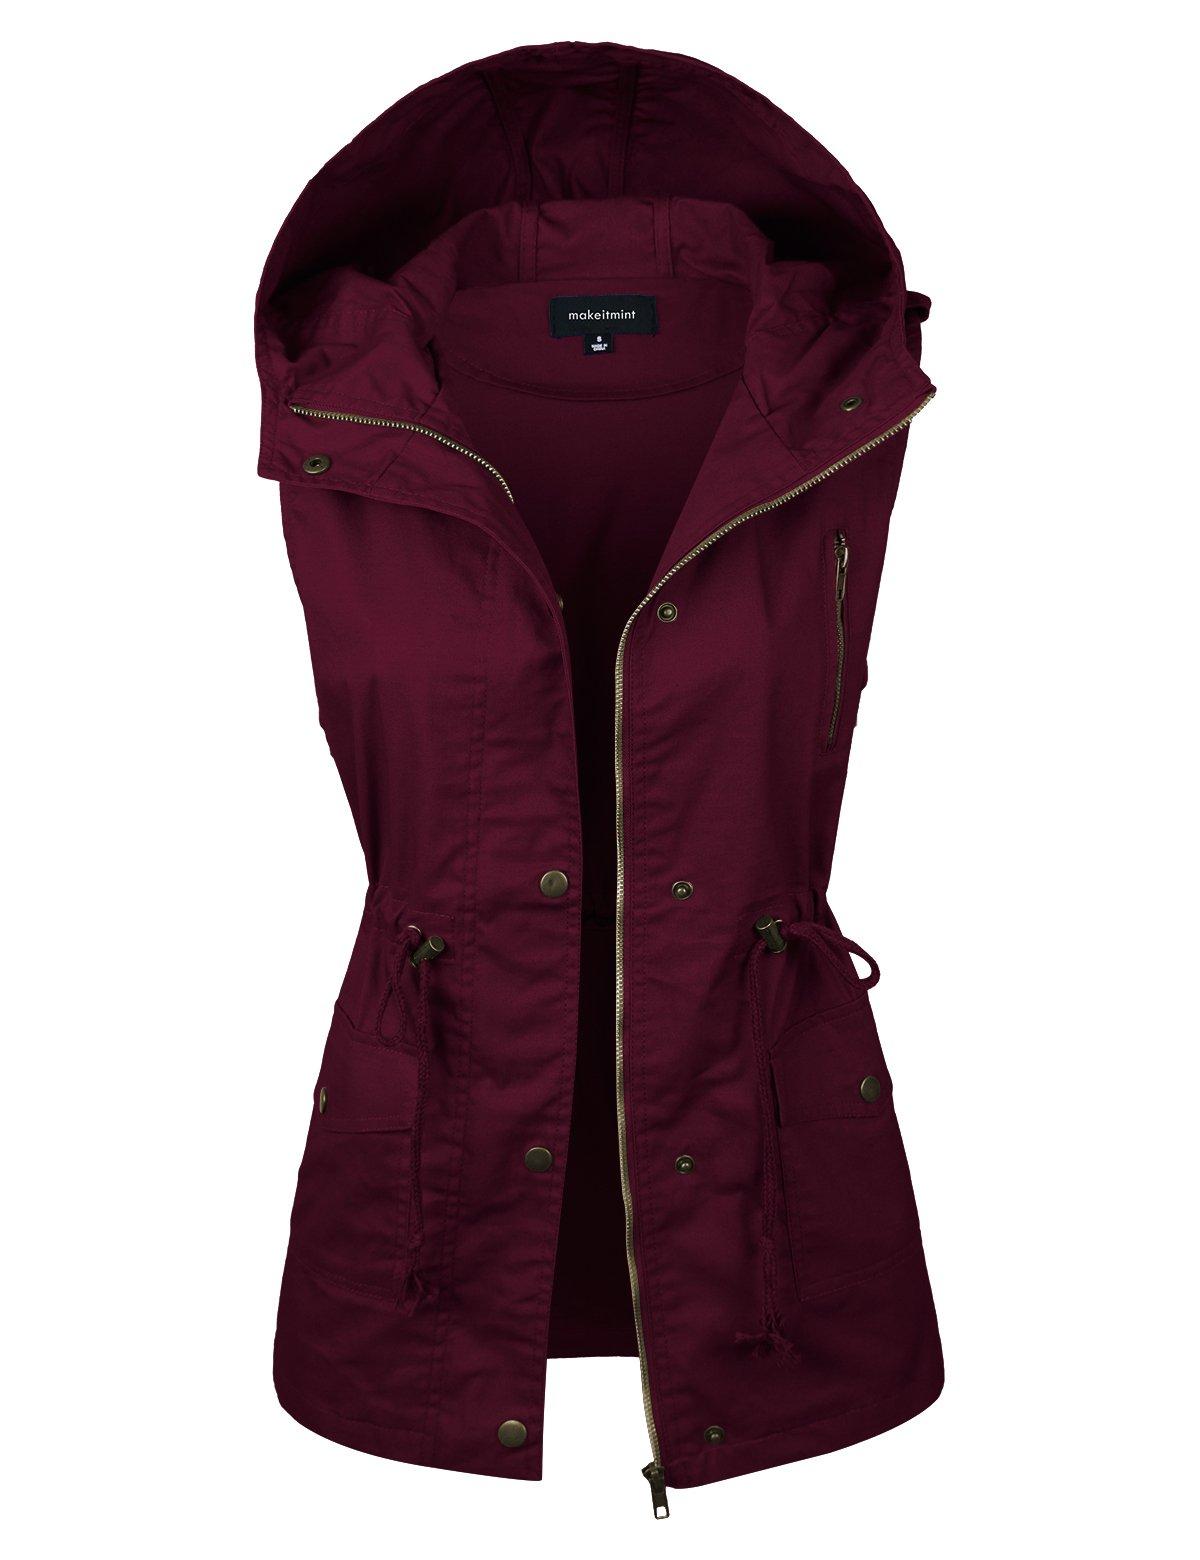 makeitmint Women's Hooded Utility Pocket Anorak Jacket Vest [S-3XL/9 Colors] YJV0043-BURGUNDY-1XL